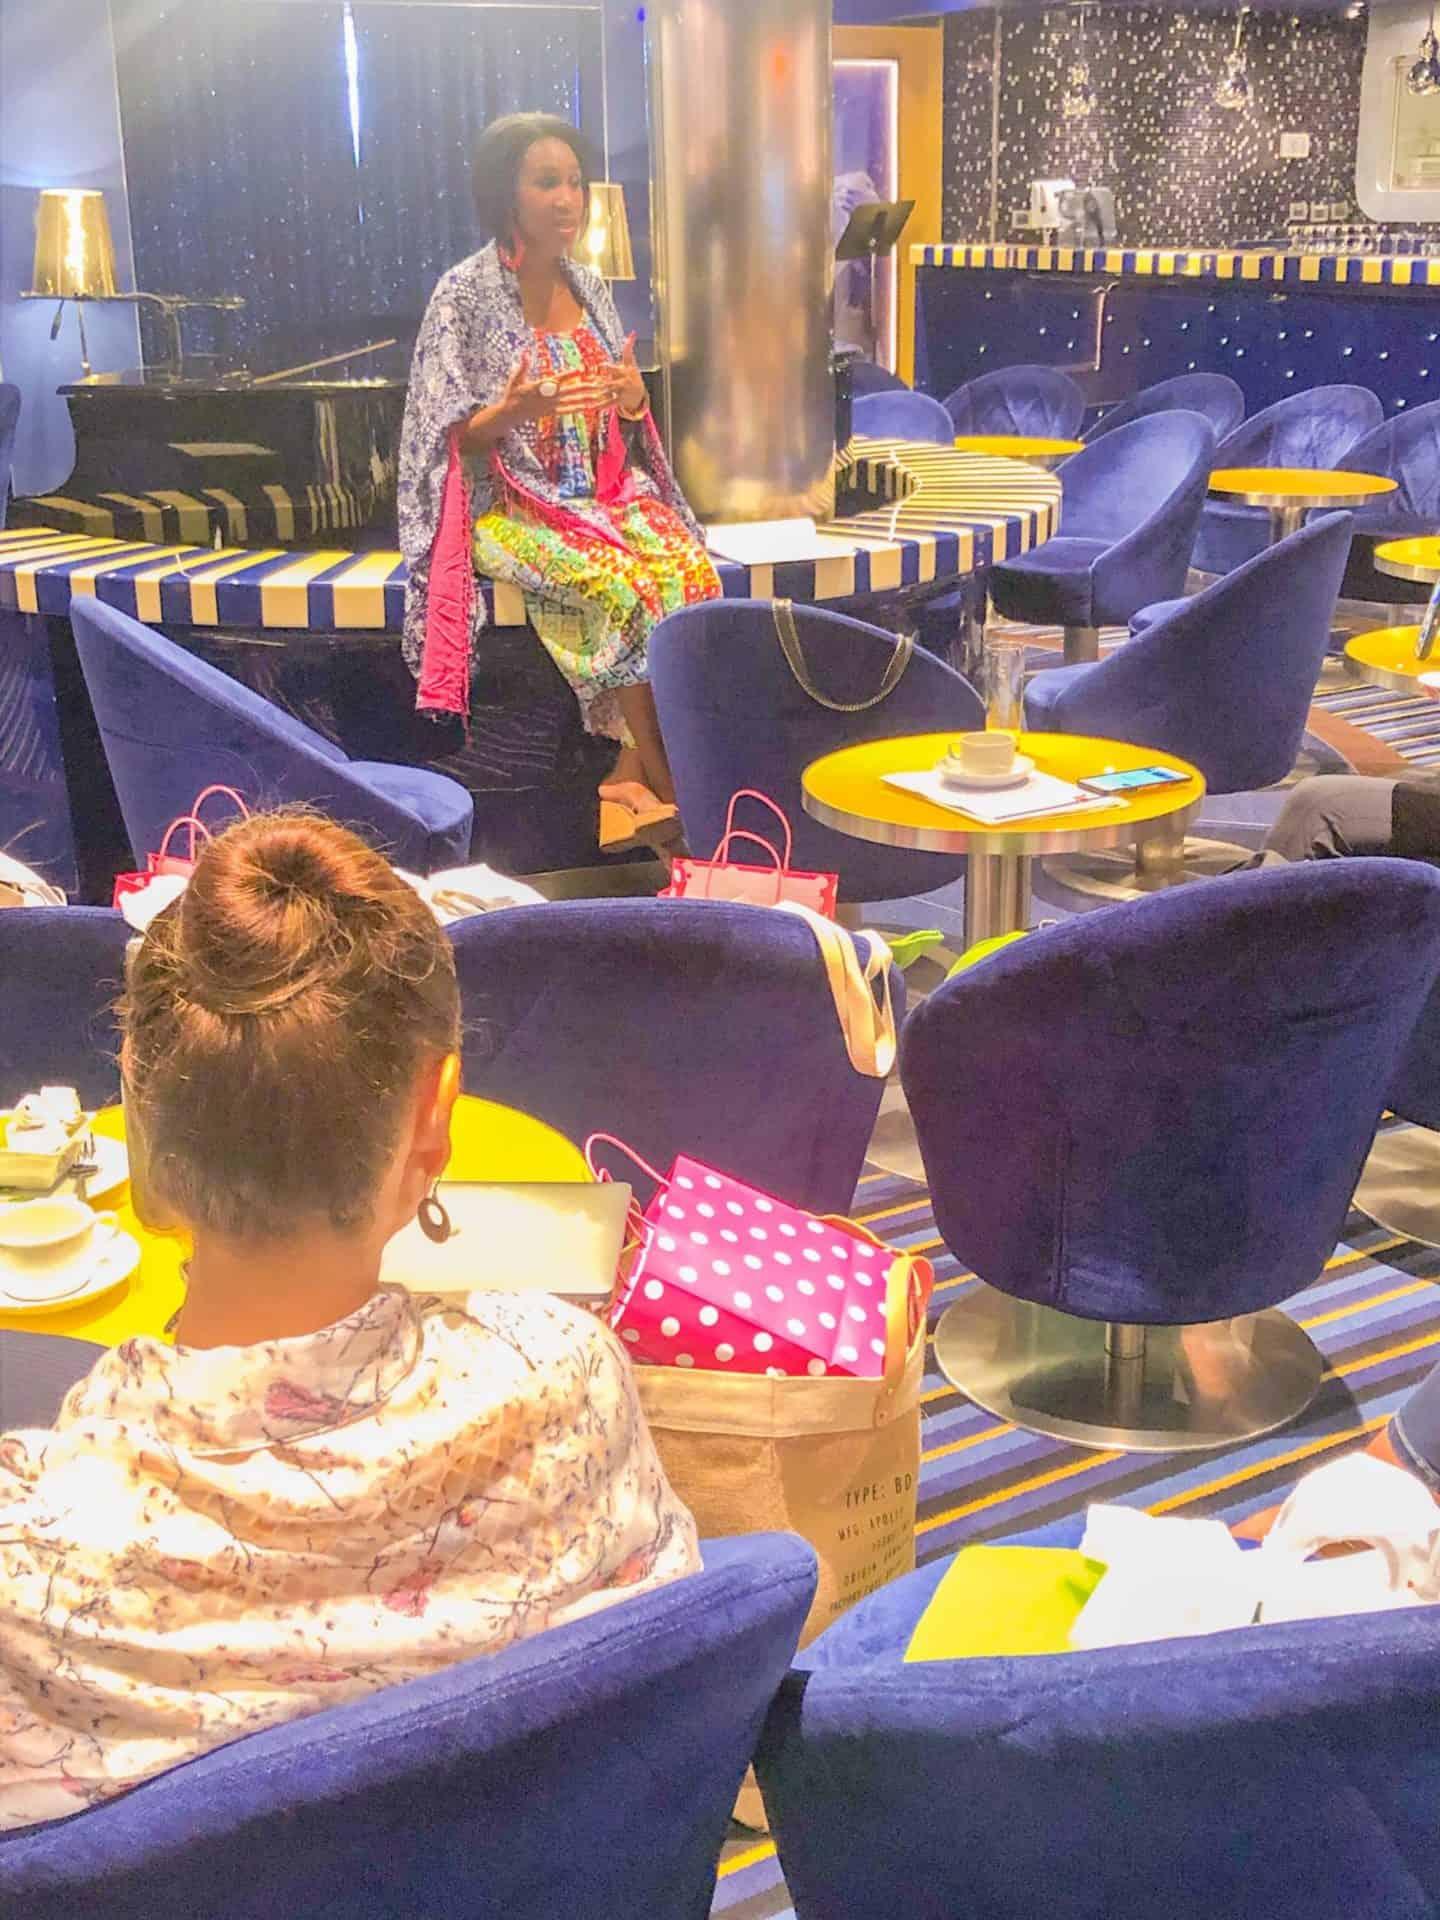 Shaunda Necole- Carnival Cruise Line Social Media Business Retreat Speaking Event